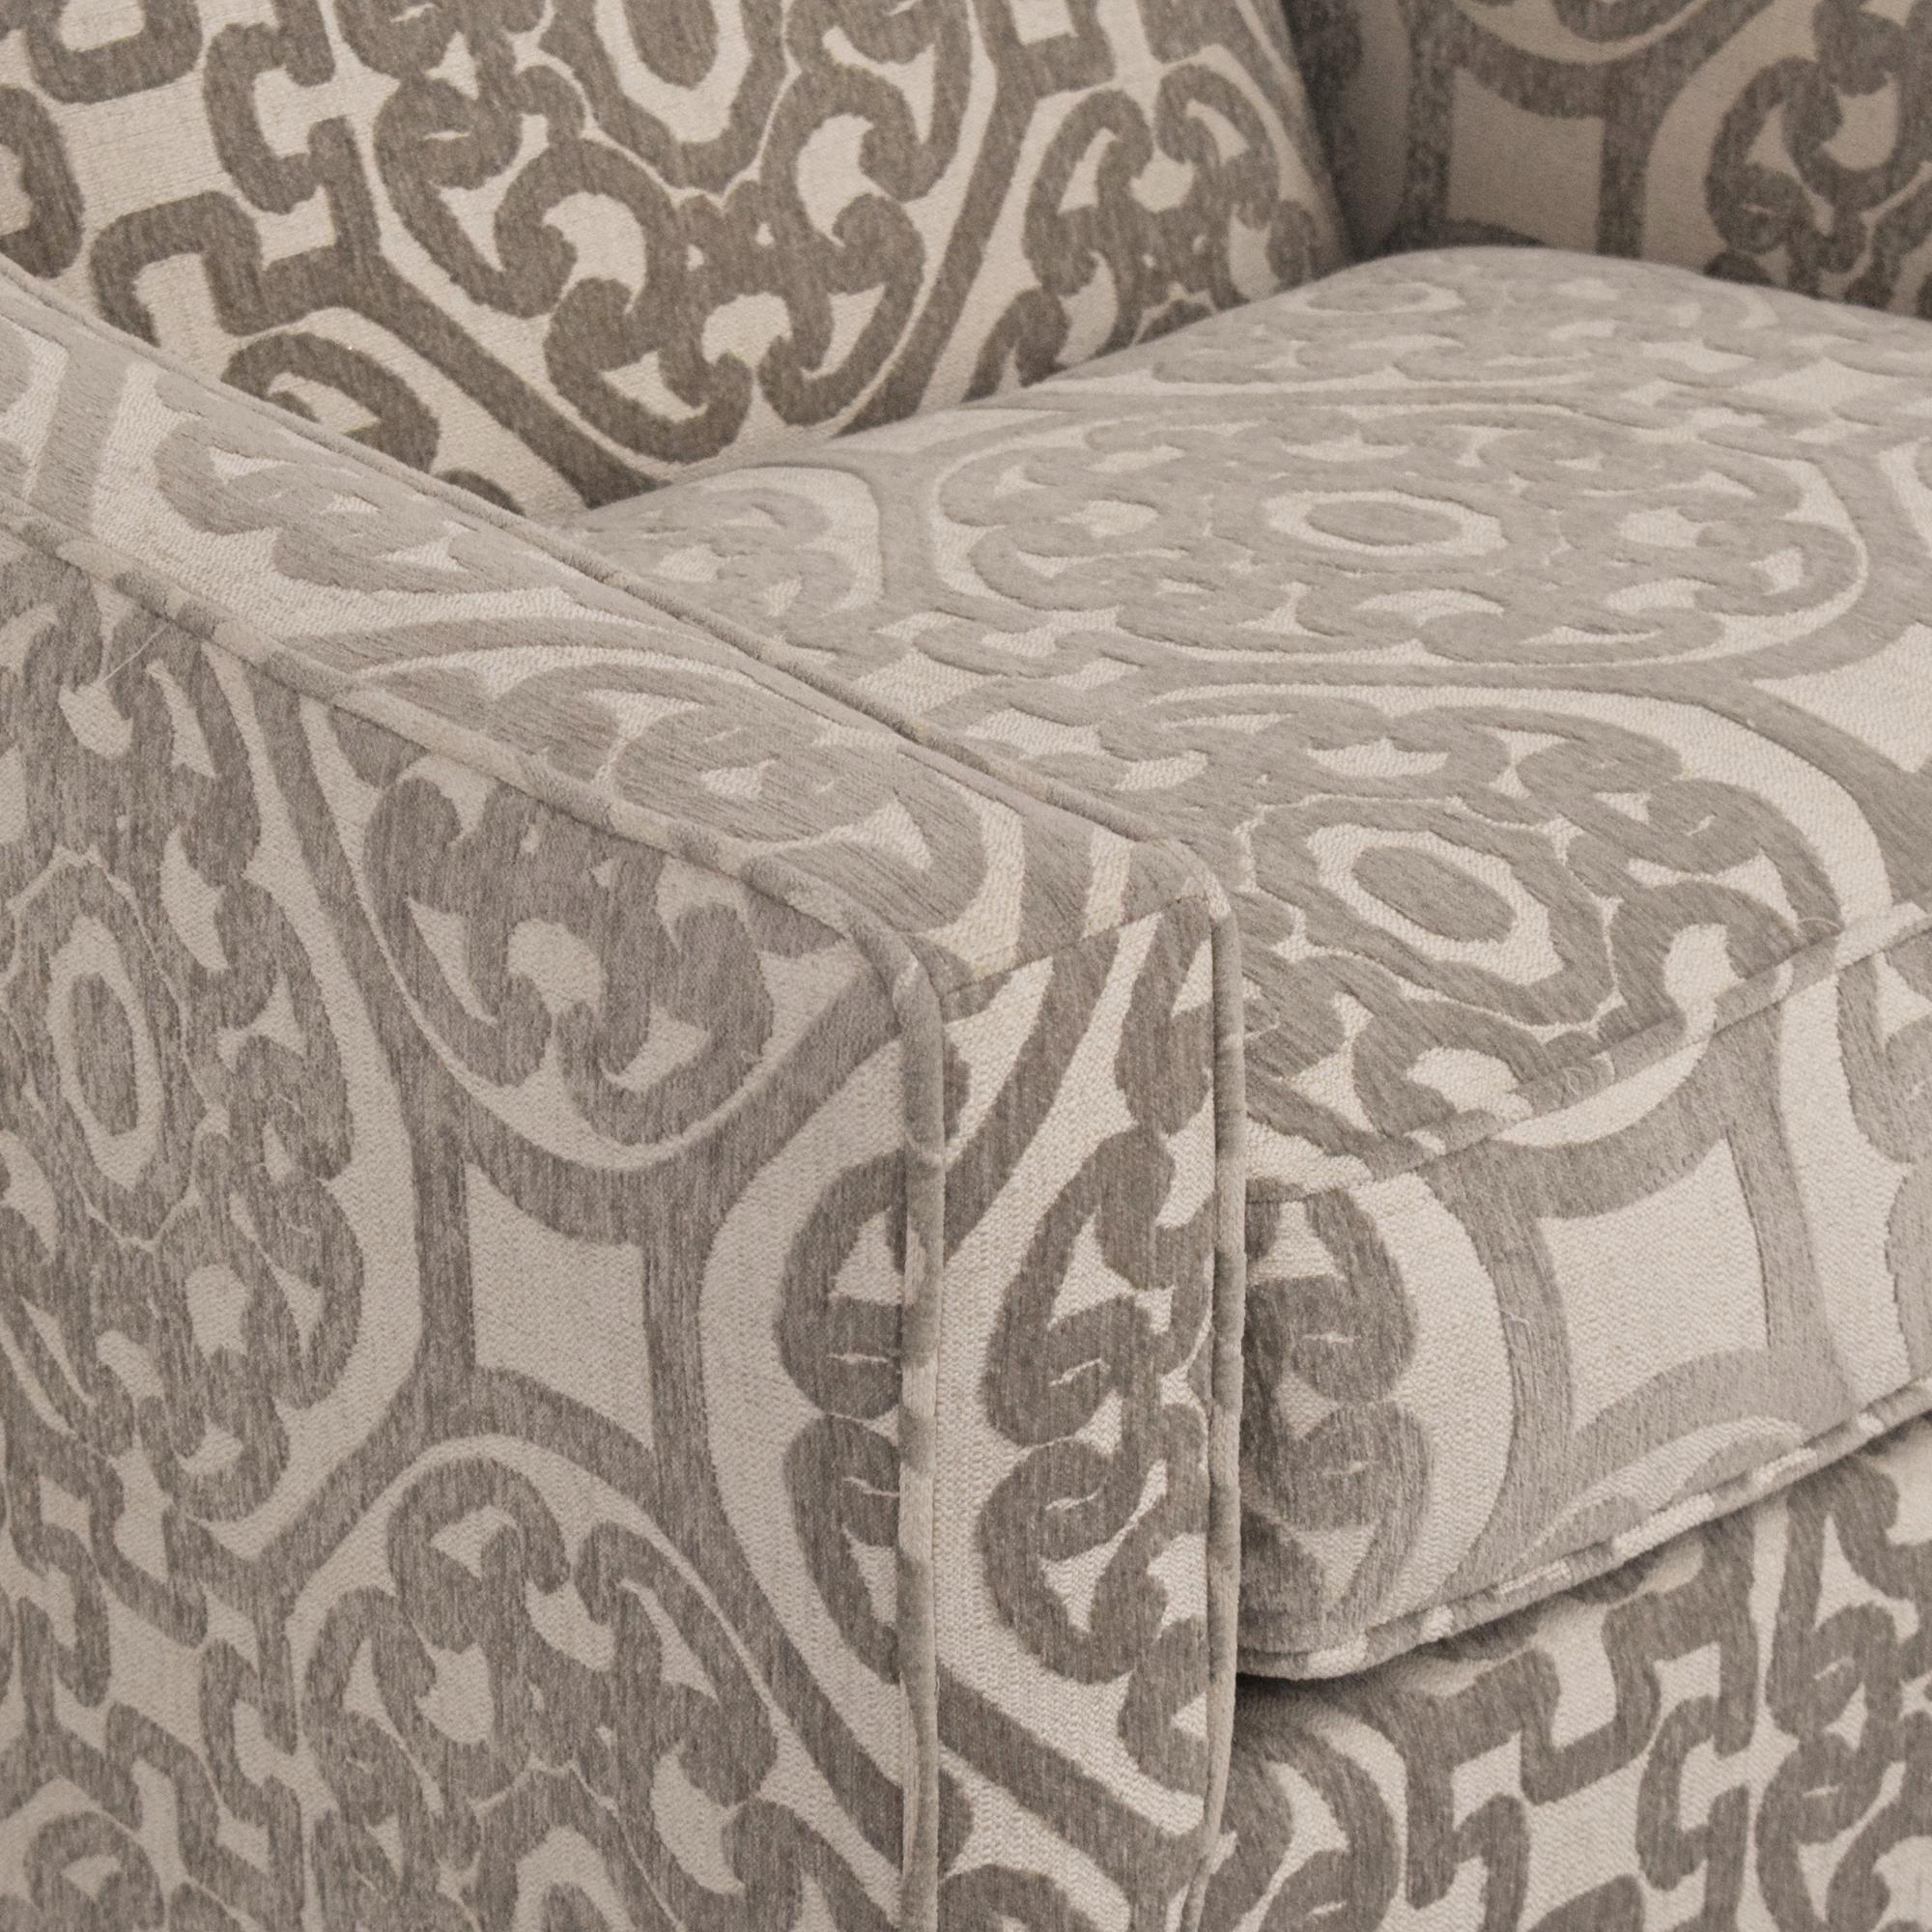 Raymour & Flanigan Raymour & Flanigan Cindy Crawford Home Calista Chair discount